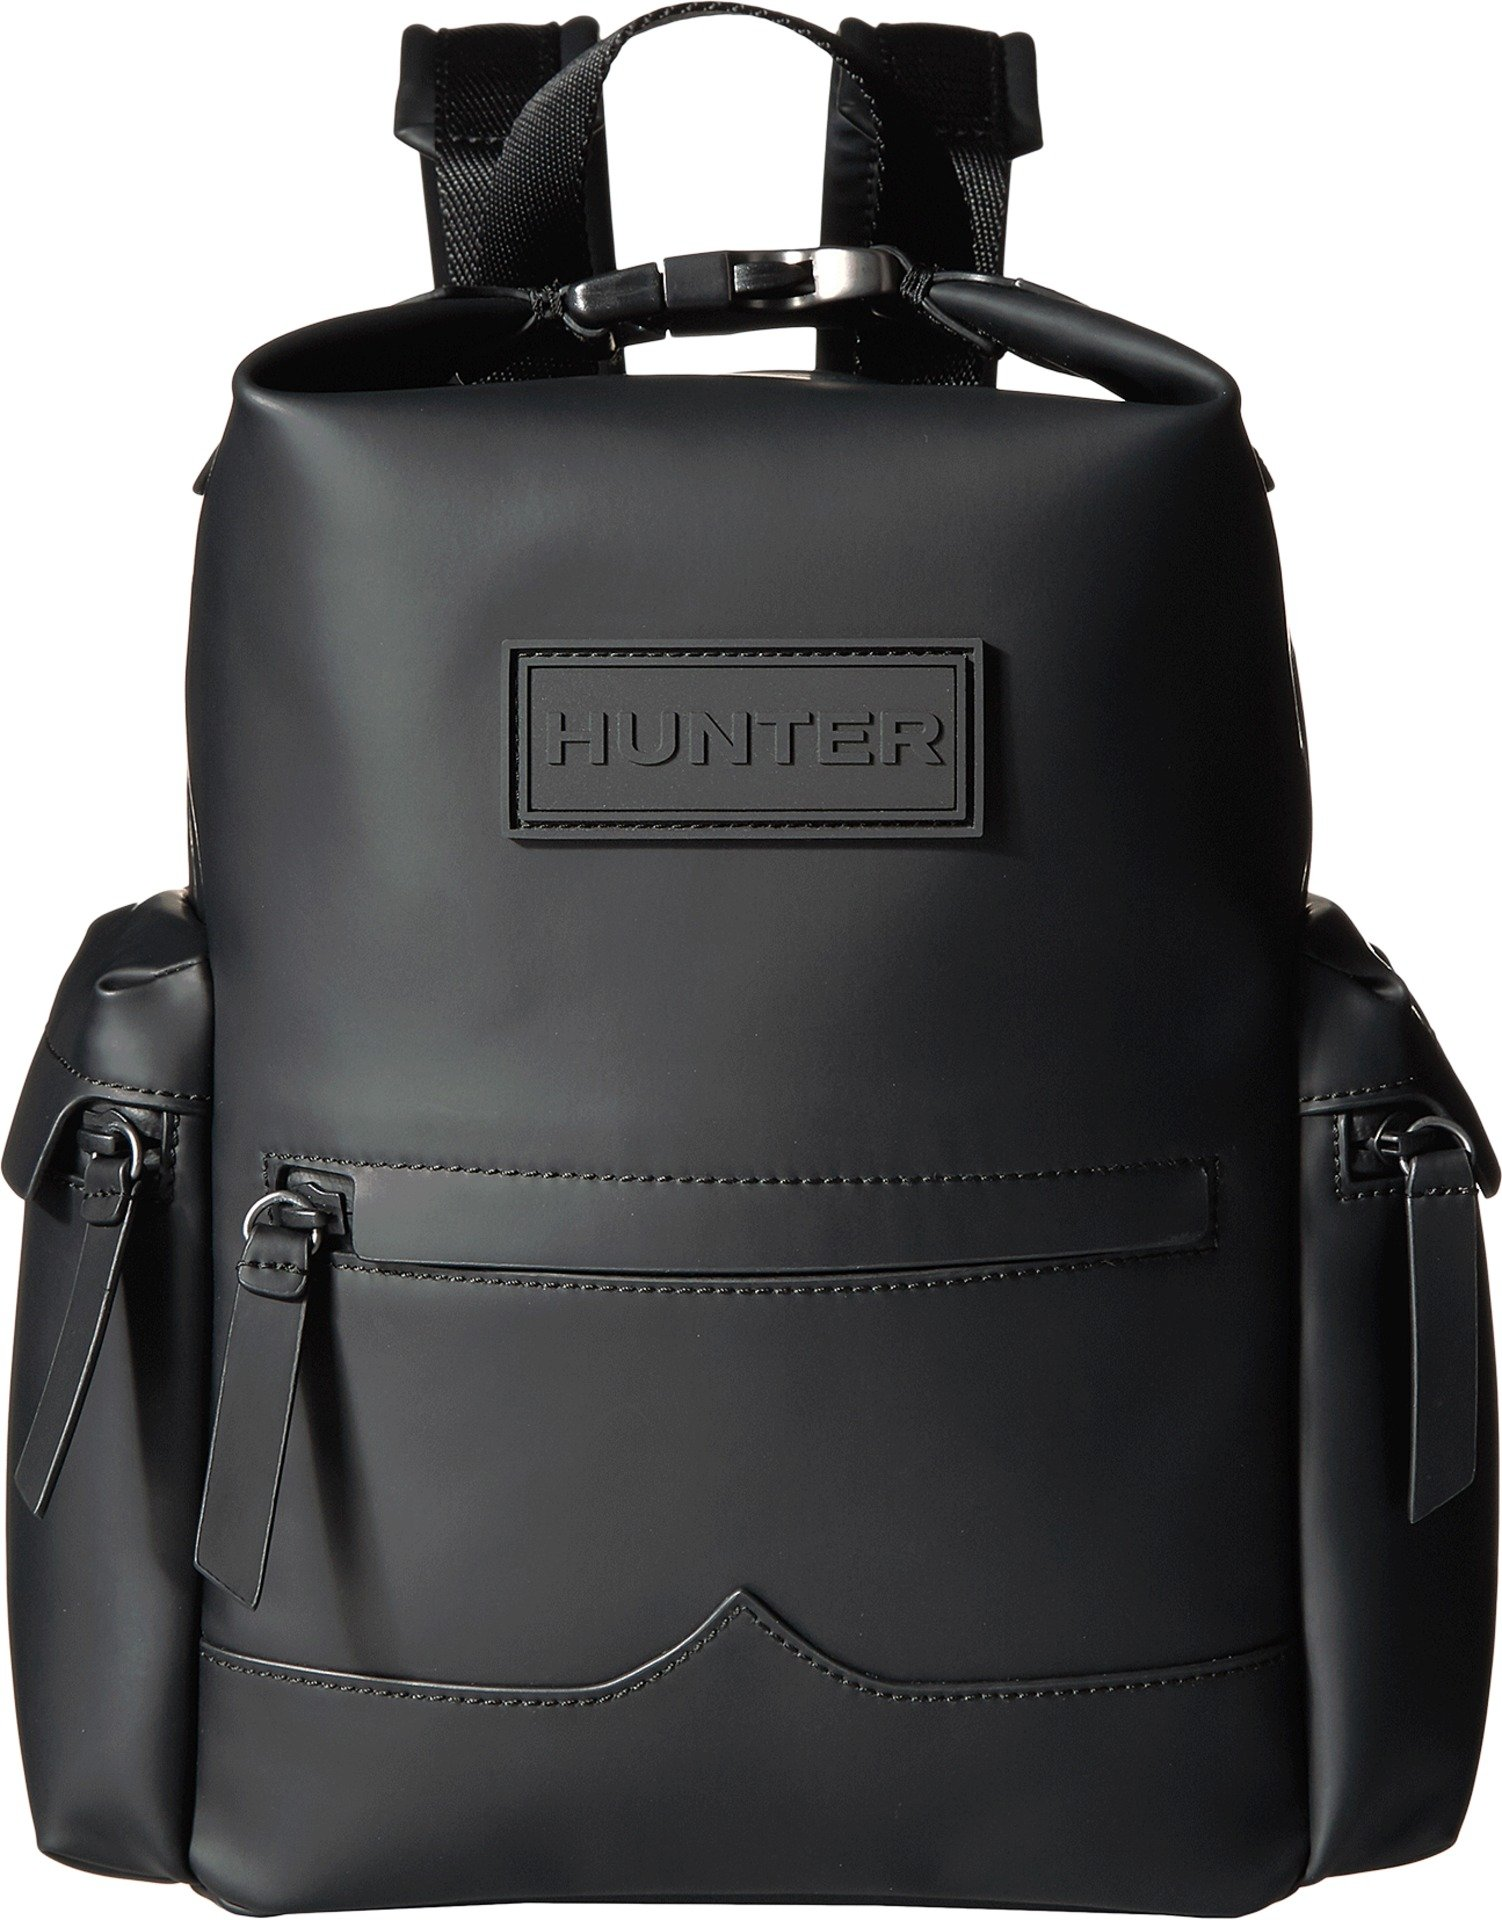 Hunter Boots Men's Original Rubberised Leather Backpack, Black, One Size